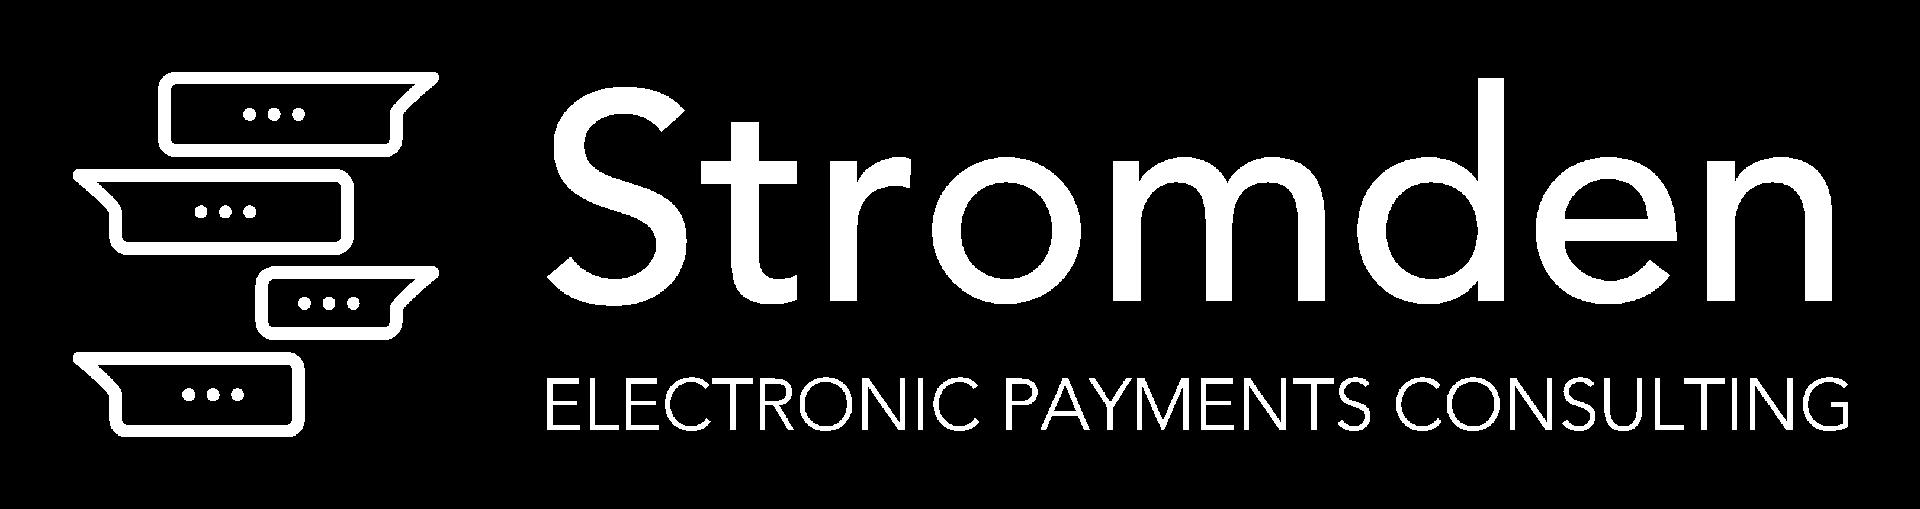 white_logo_tran